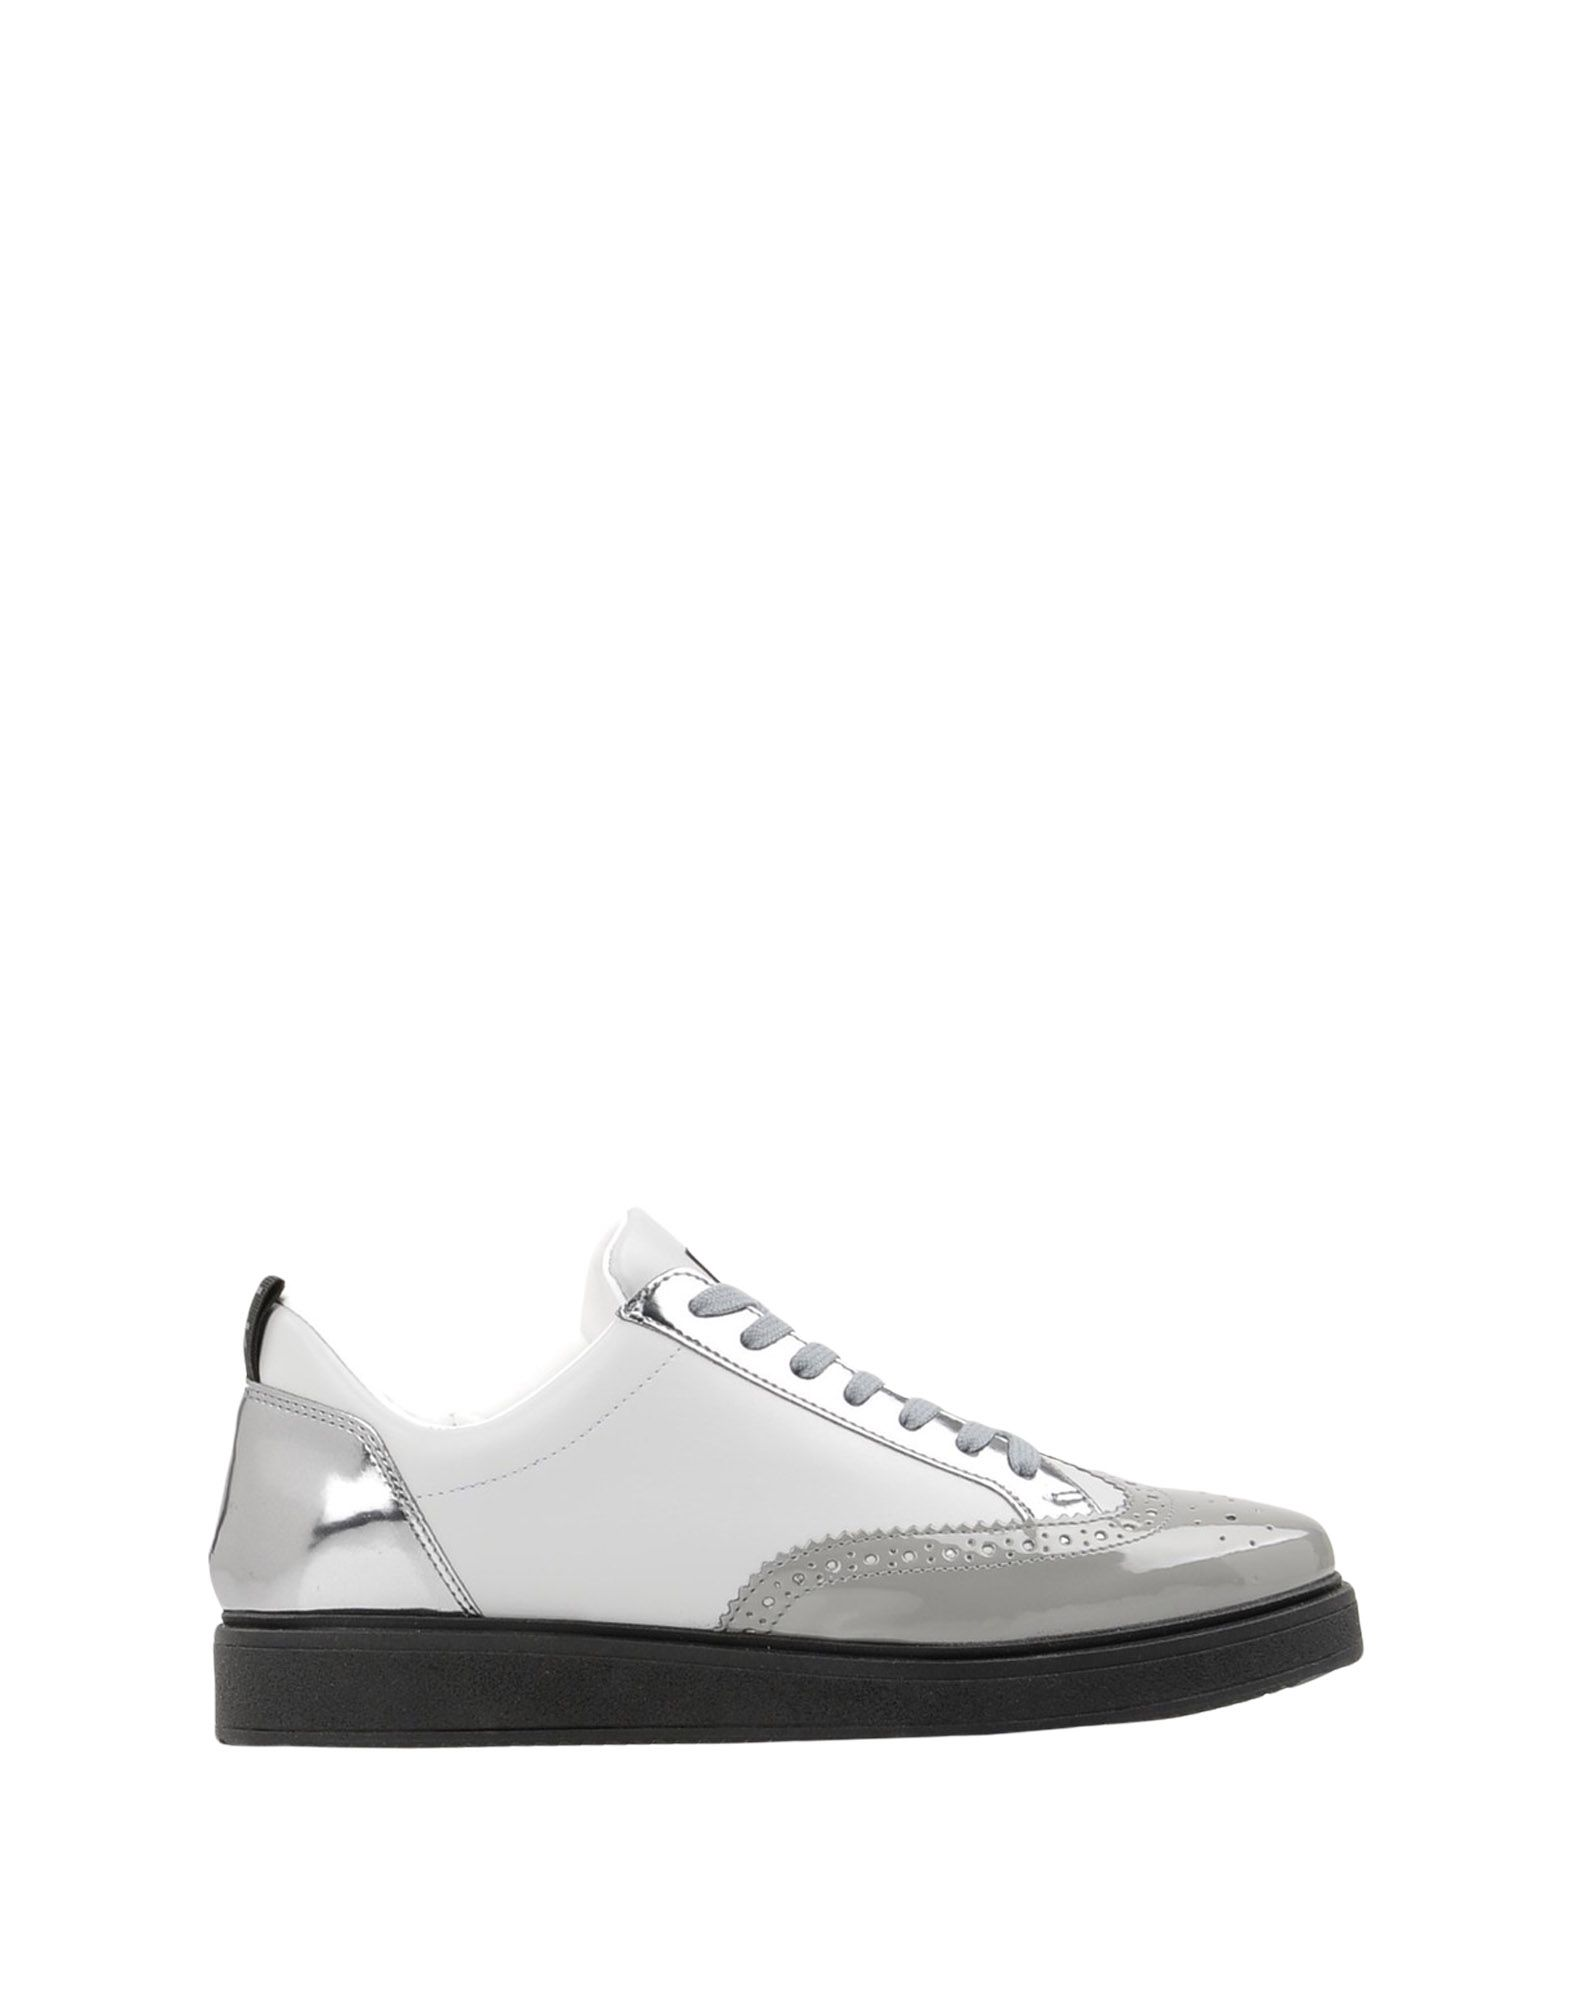 Haltbare Schuhe Mode billige Schuhe Haltbare L4k3 Sneakers Damen  11334967PL Heiße Schuhe d939c9